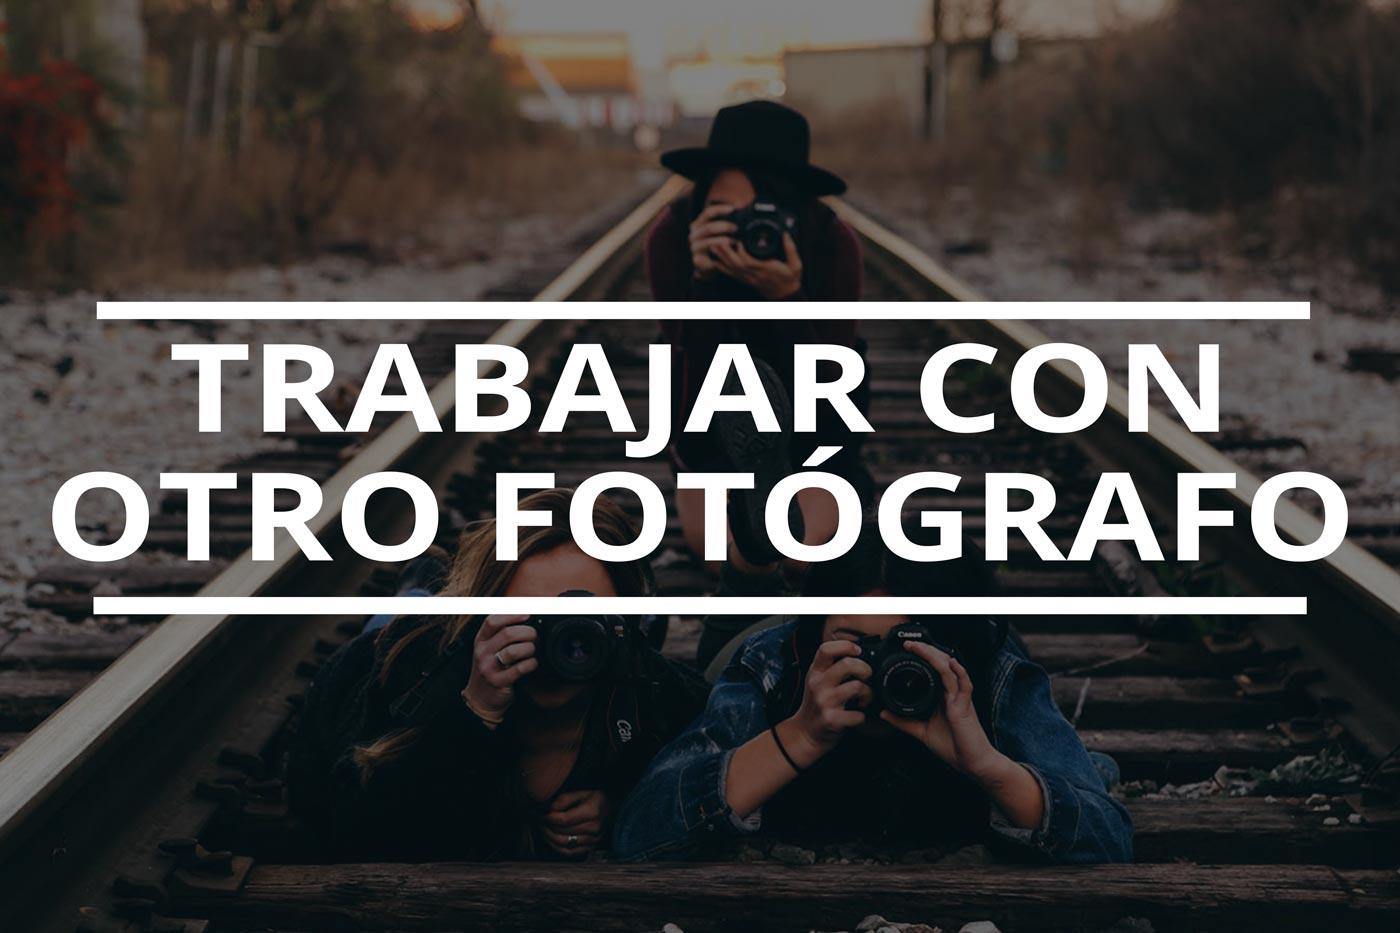 Trabajar con otro fotógrafo o ayudante